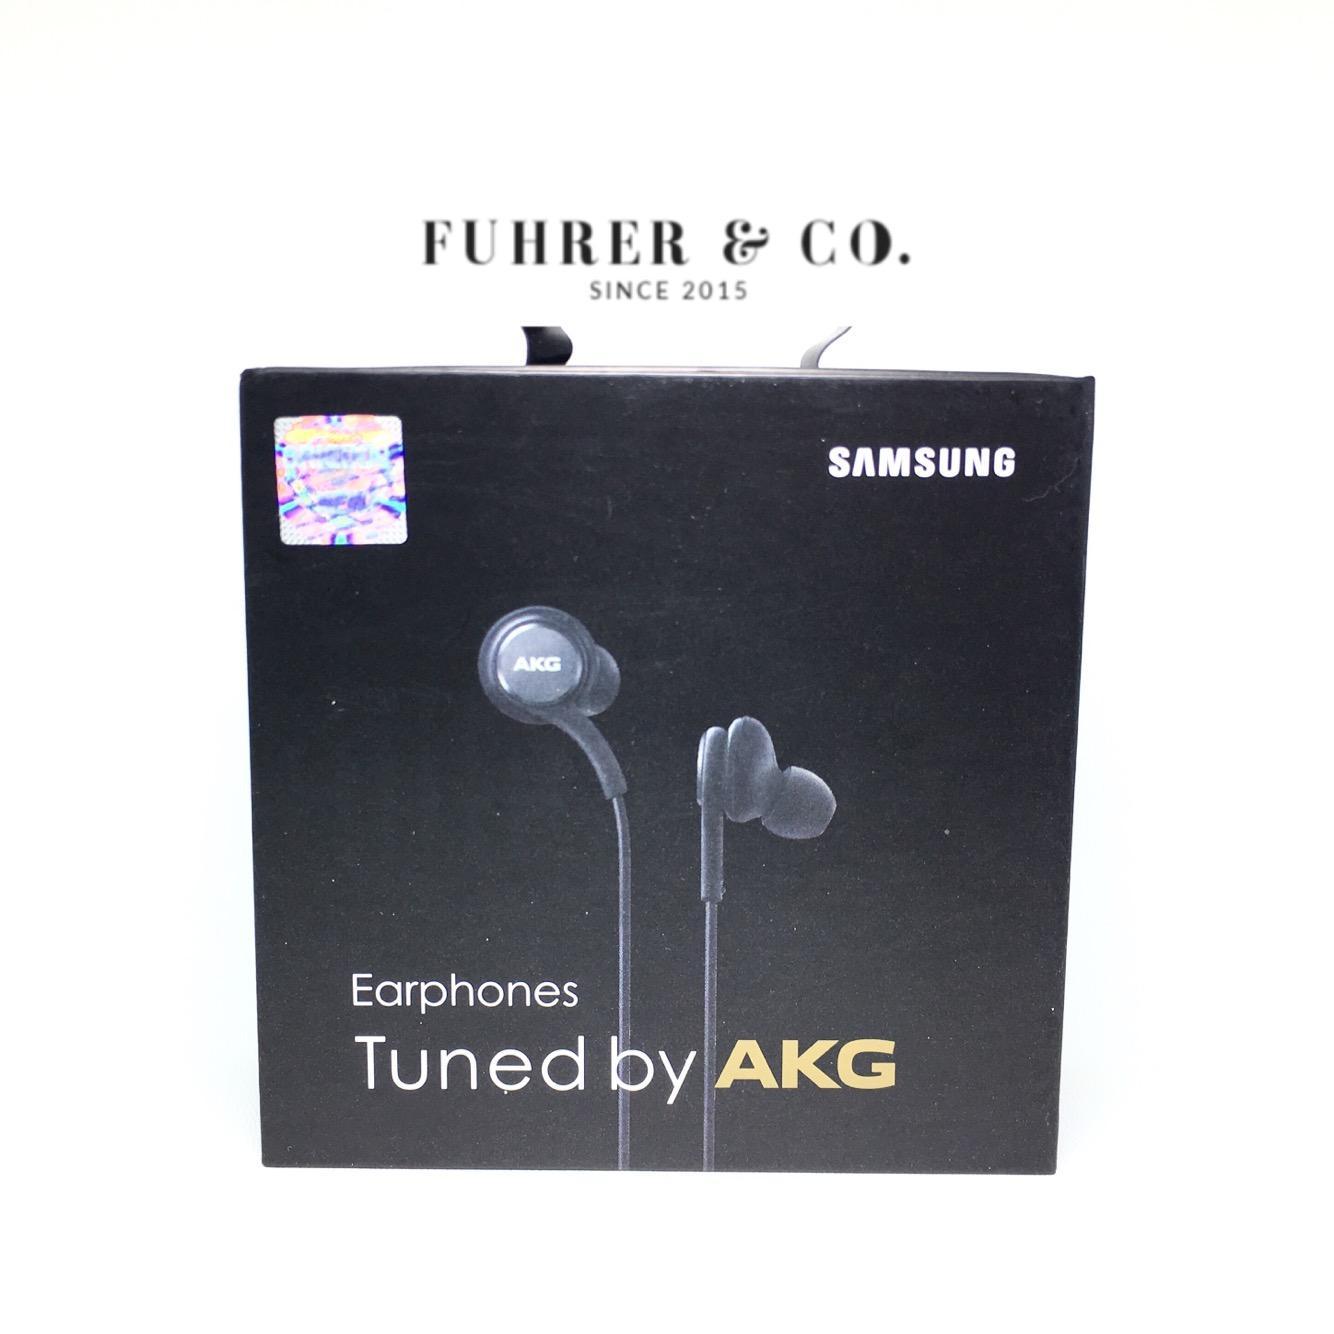 Earpods Handsfree Headset Earphone AKG Samsung Galaxy S8 S9 S8 Plus S9 Plus Original